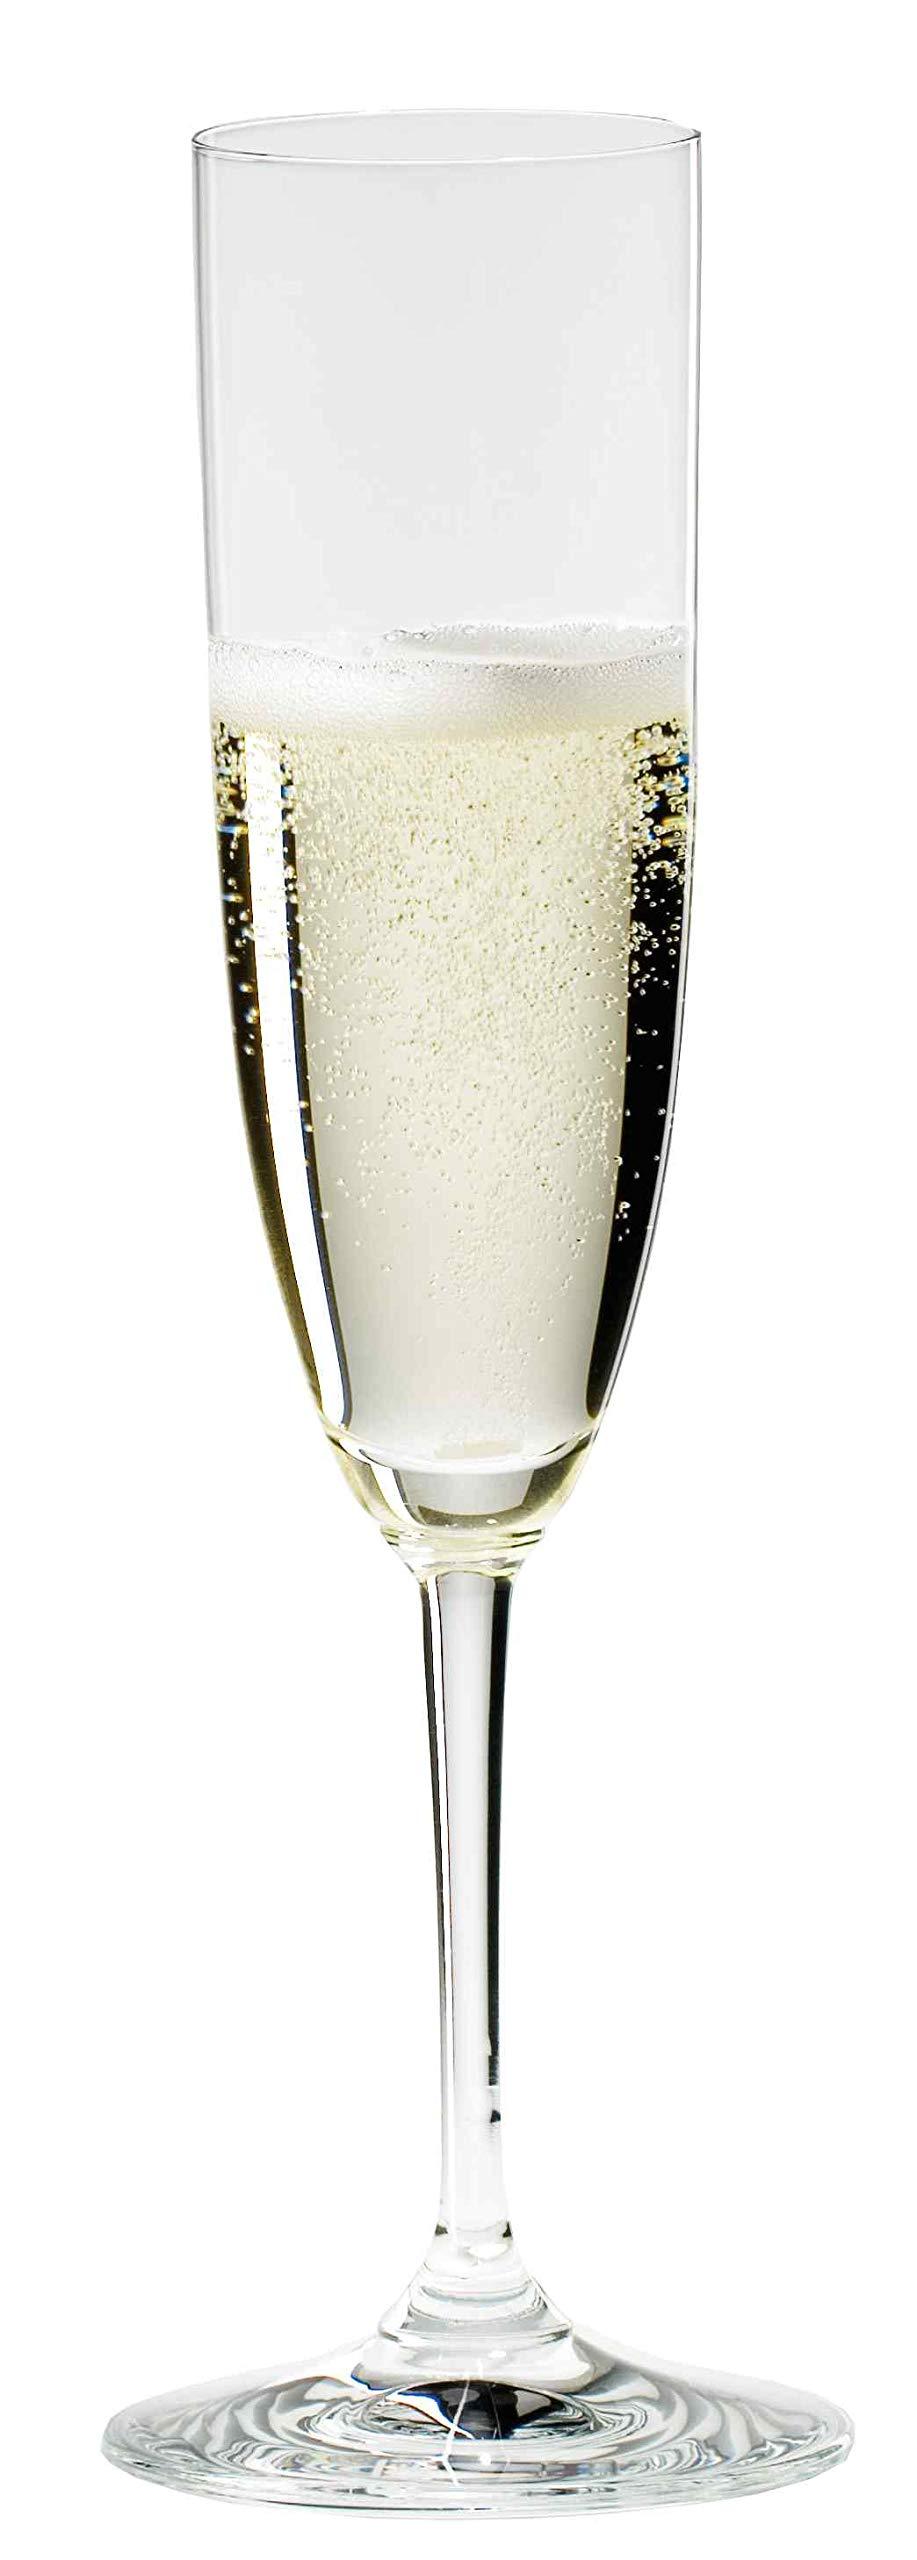 Riedel Vinum Champagne Glasses, Set of 6